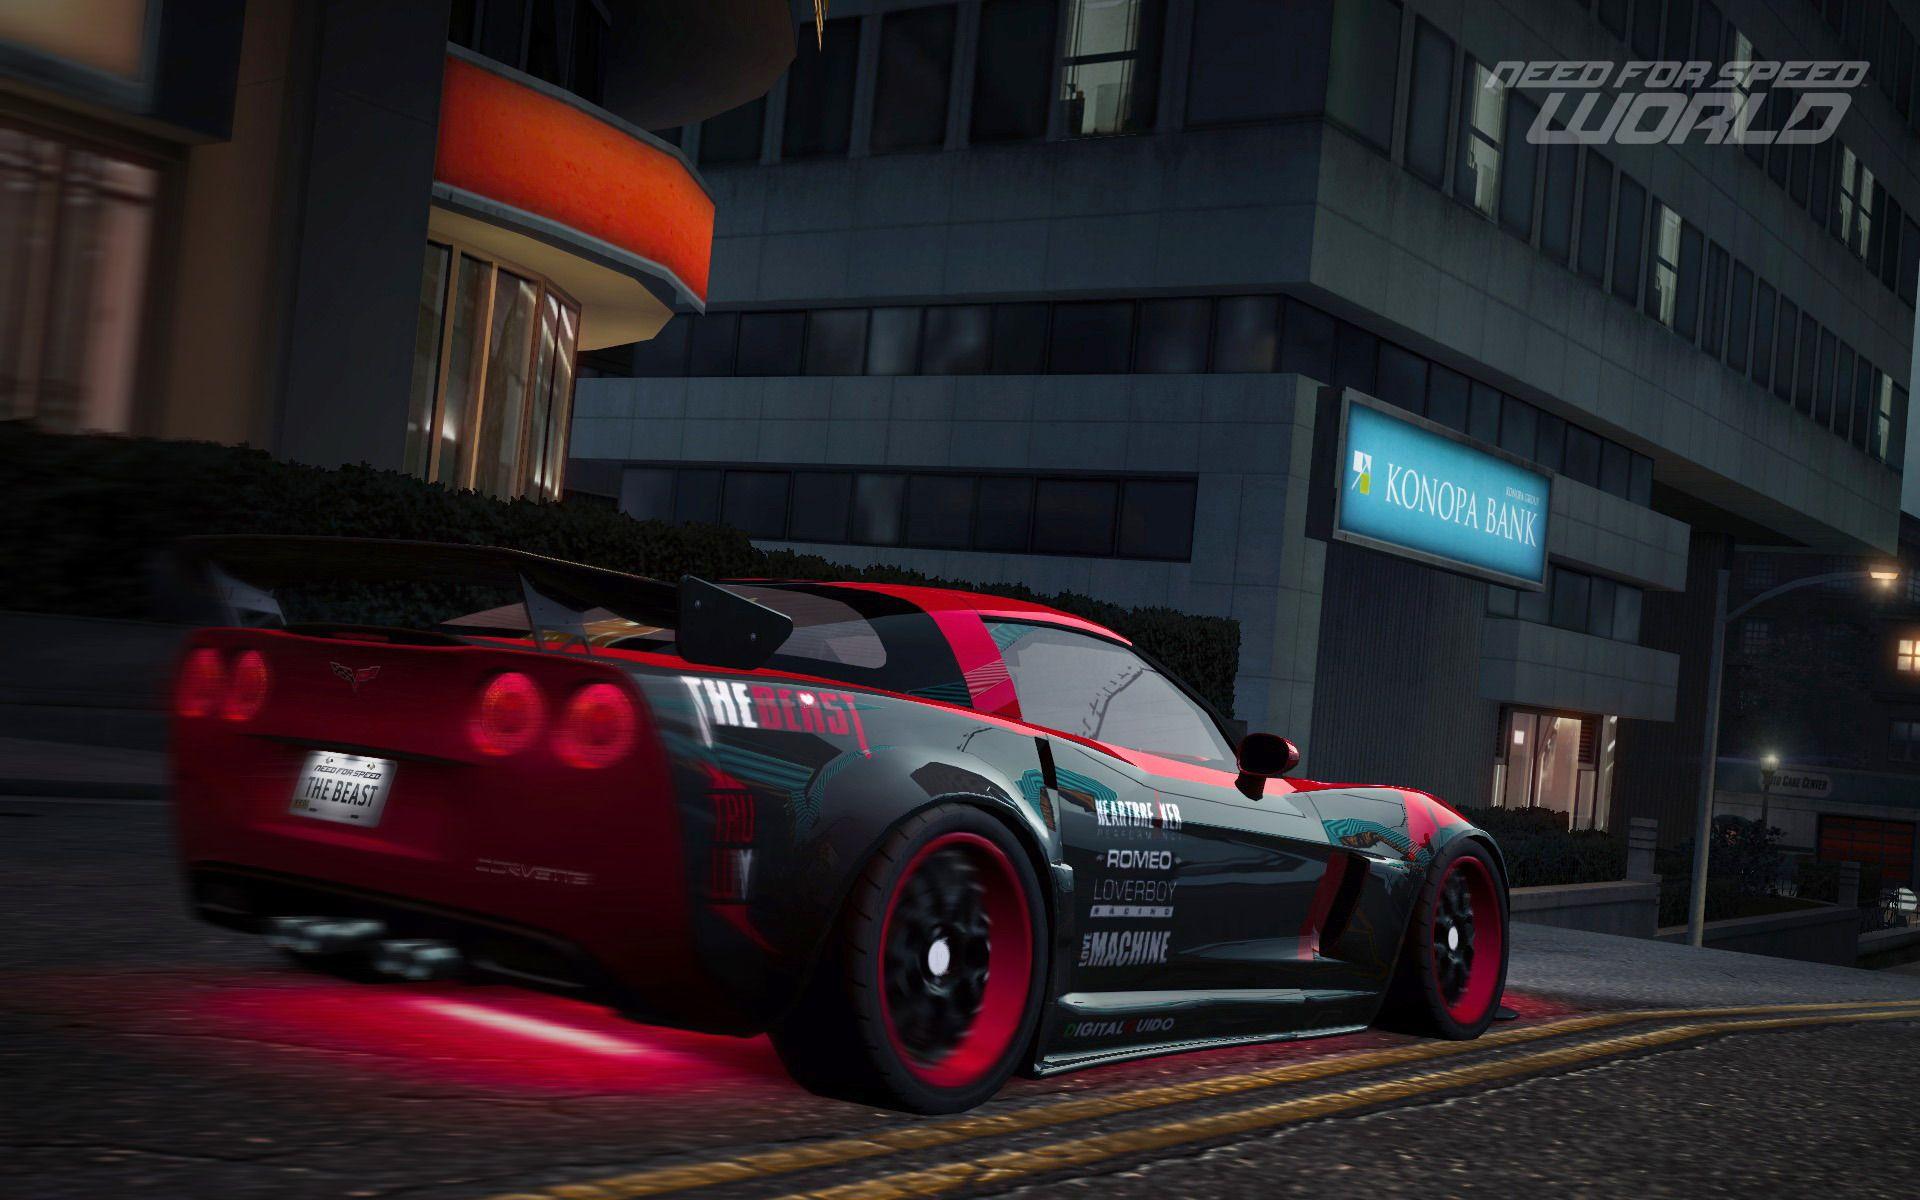 Corvette Screensavers Nfswo Beast Screensaver Images